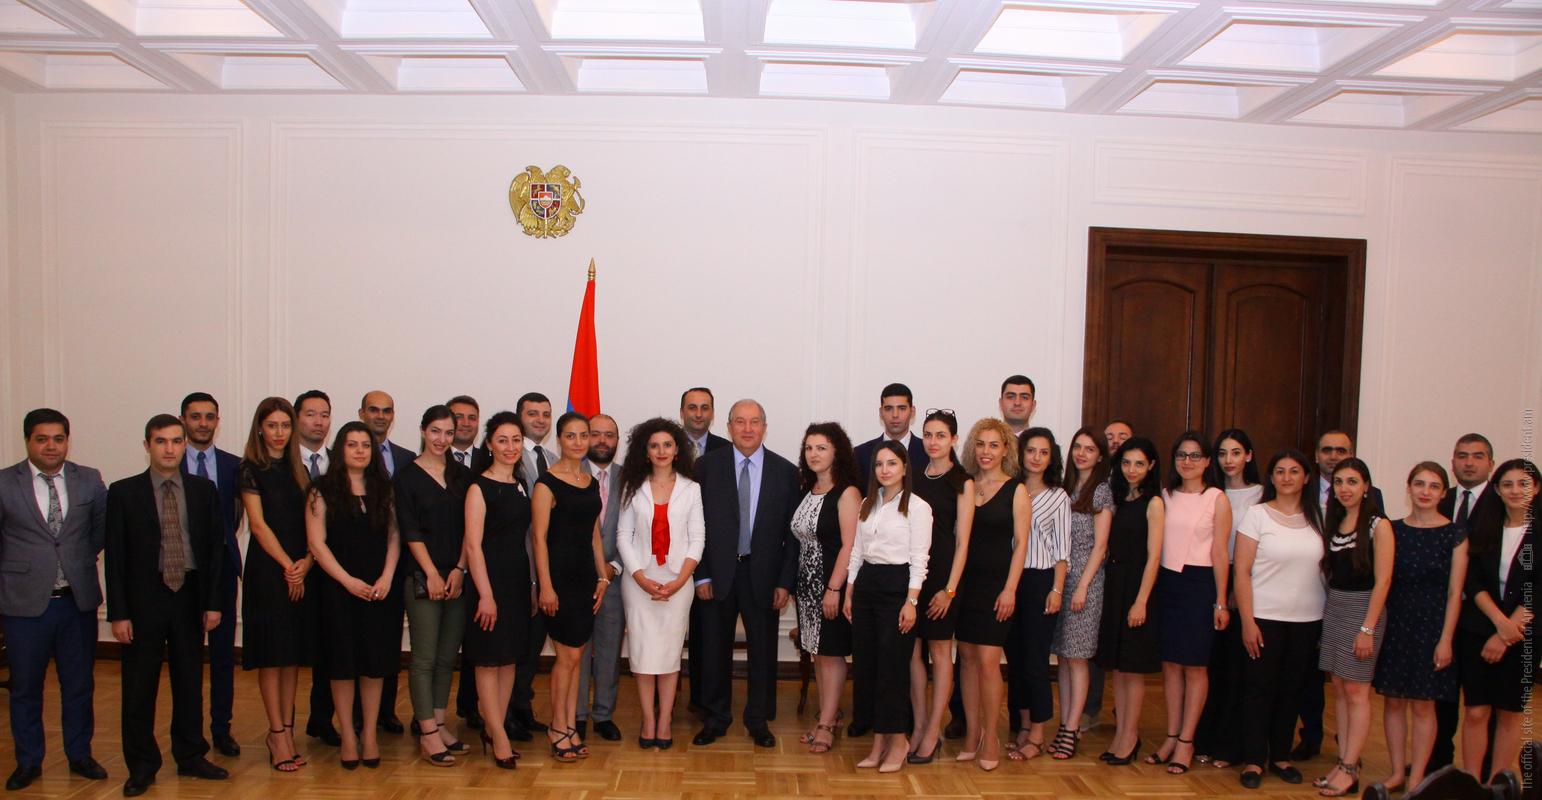 Президент Армении Армен Саркисян призвал молодежь к активному участию в развитии страны